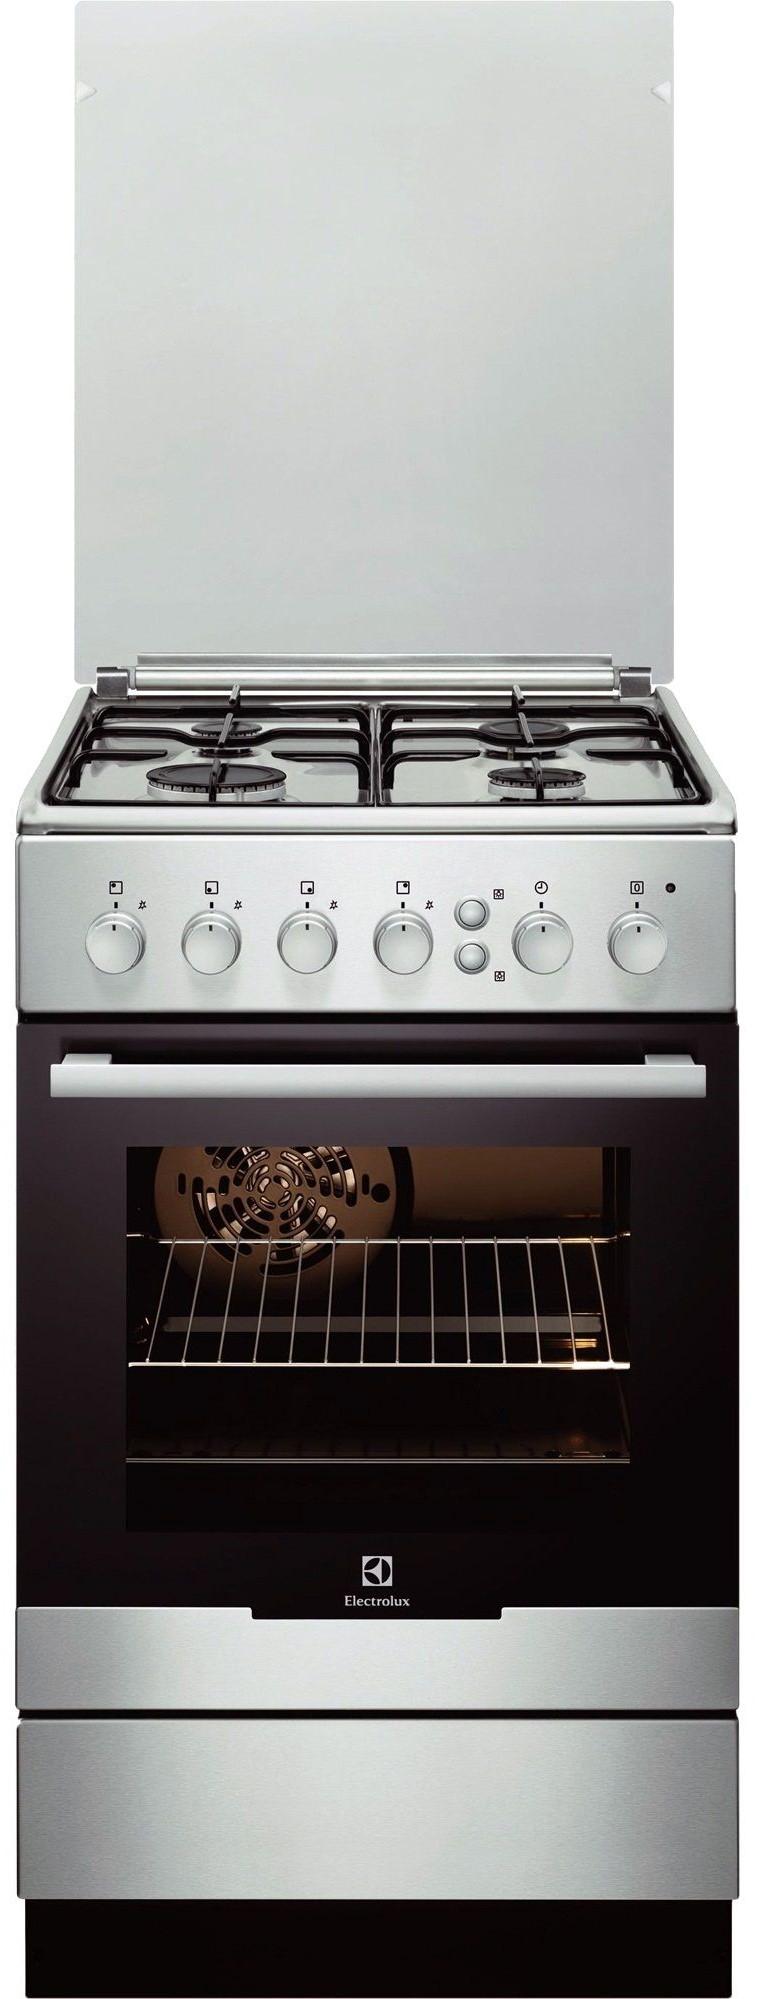 Aragaz pe gaz Electrolux EKG51351OX, grill, Inox